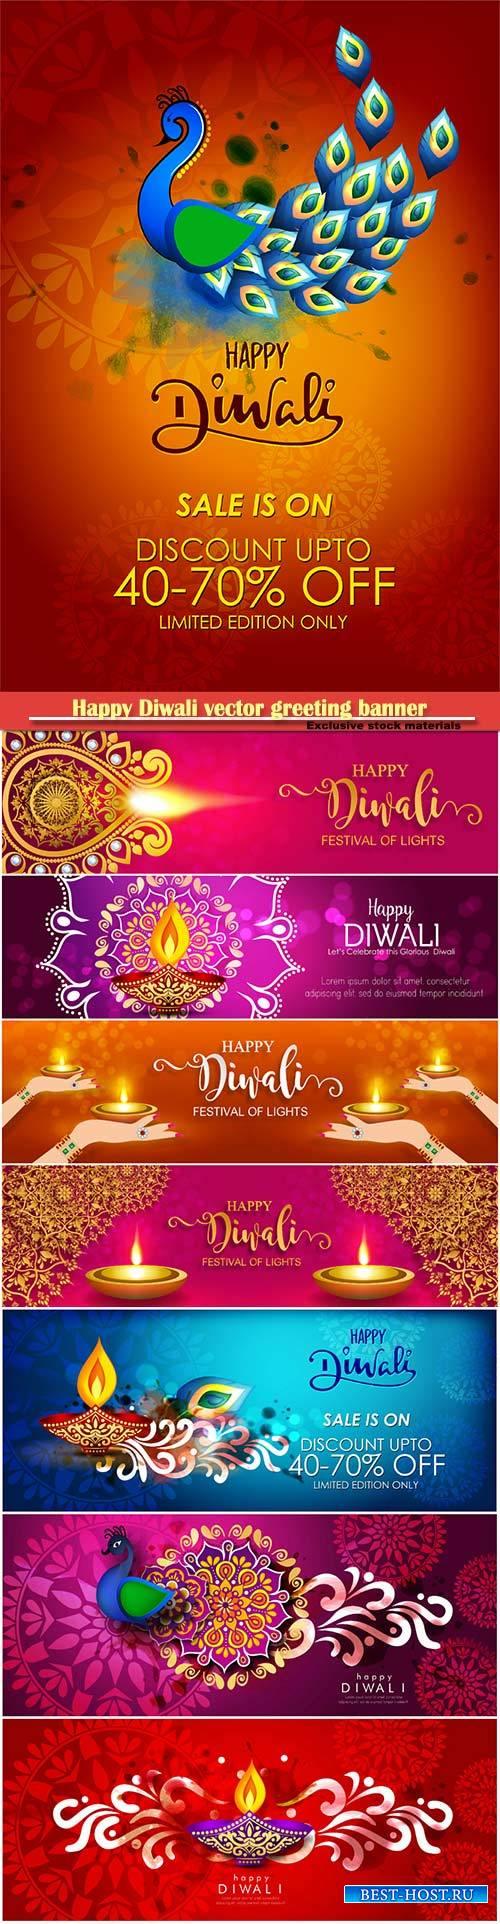 Happy Diwali vector greeting banner design